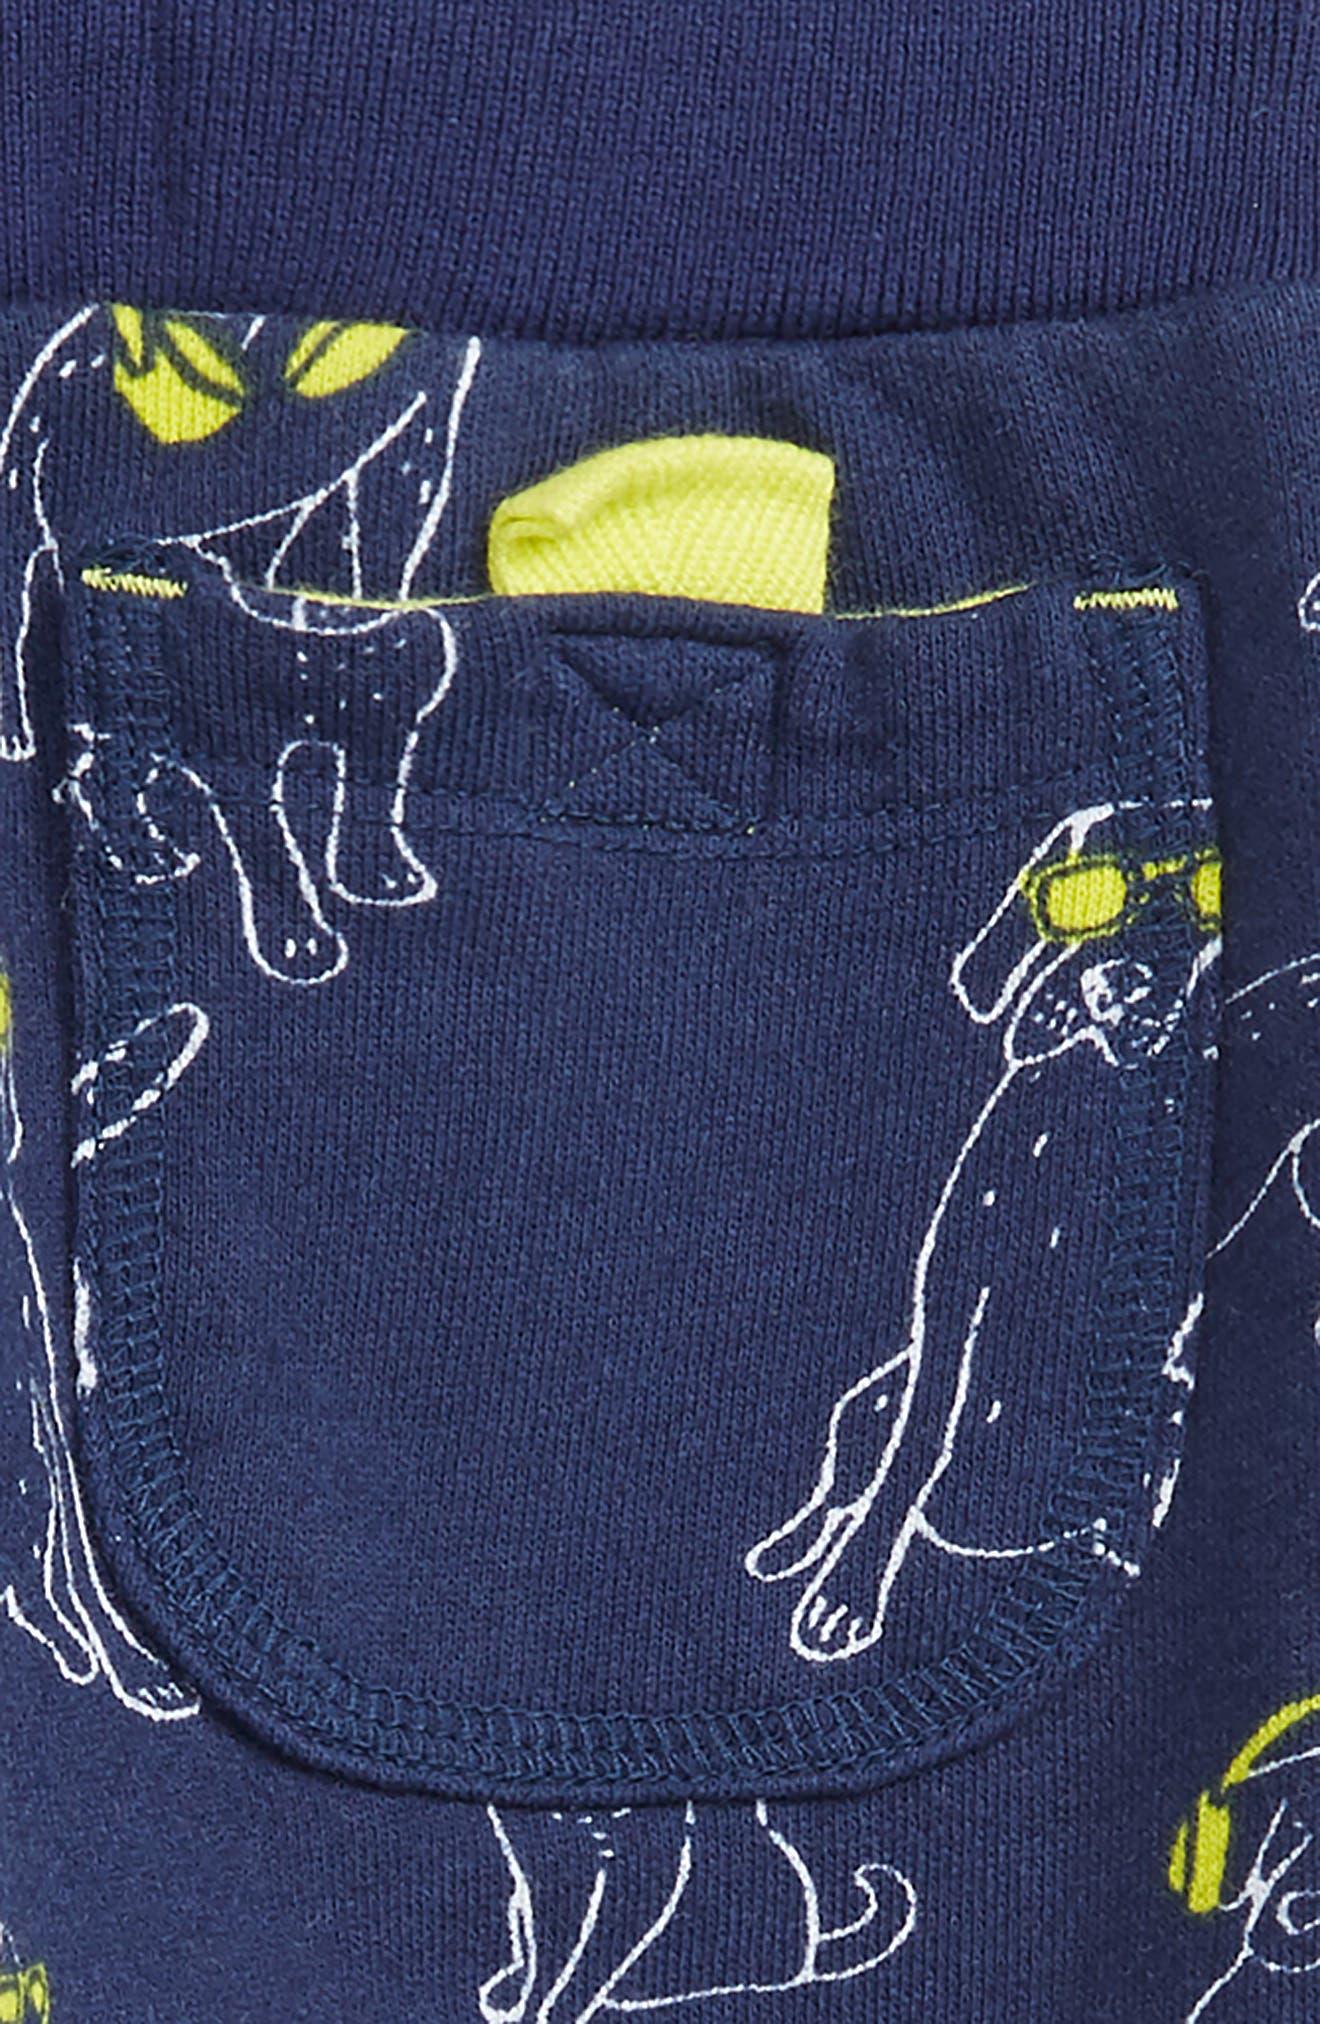 DJ Dogs Jogger Pants,                             Alternate thumbnail 3, color,                             COLLEGE BLUE